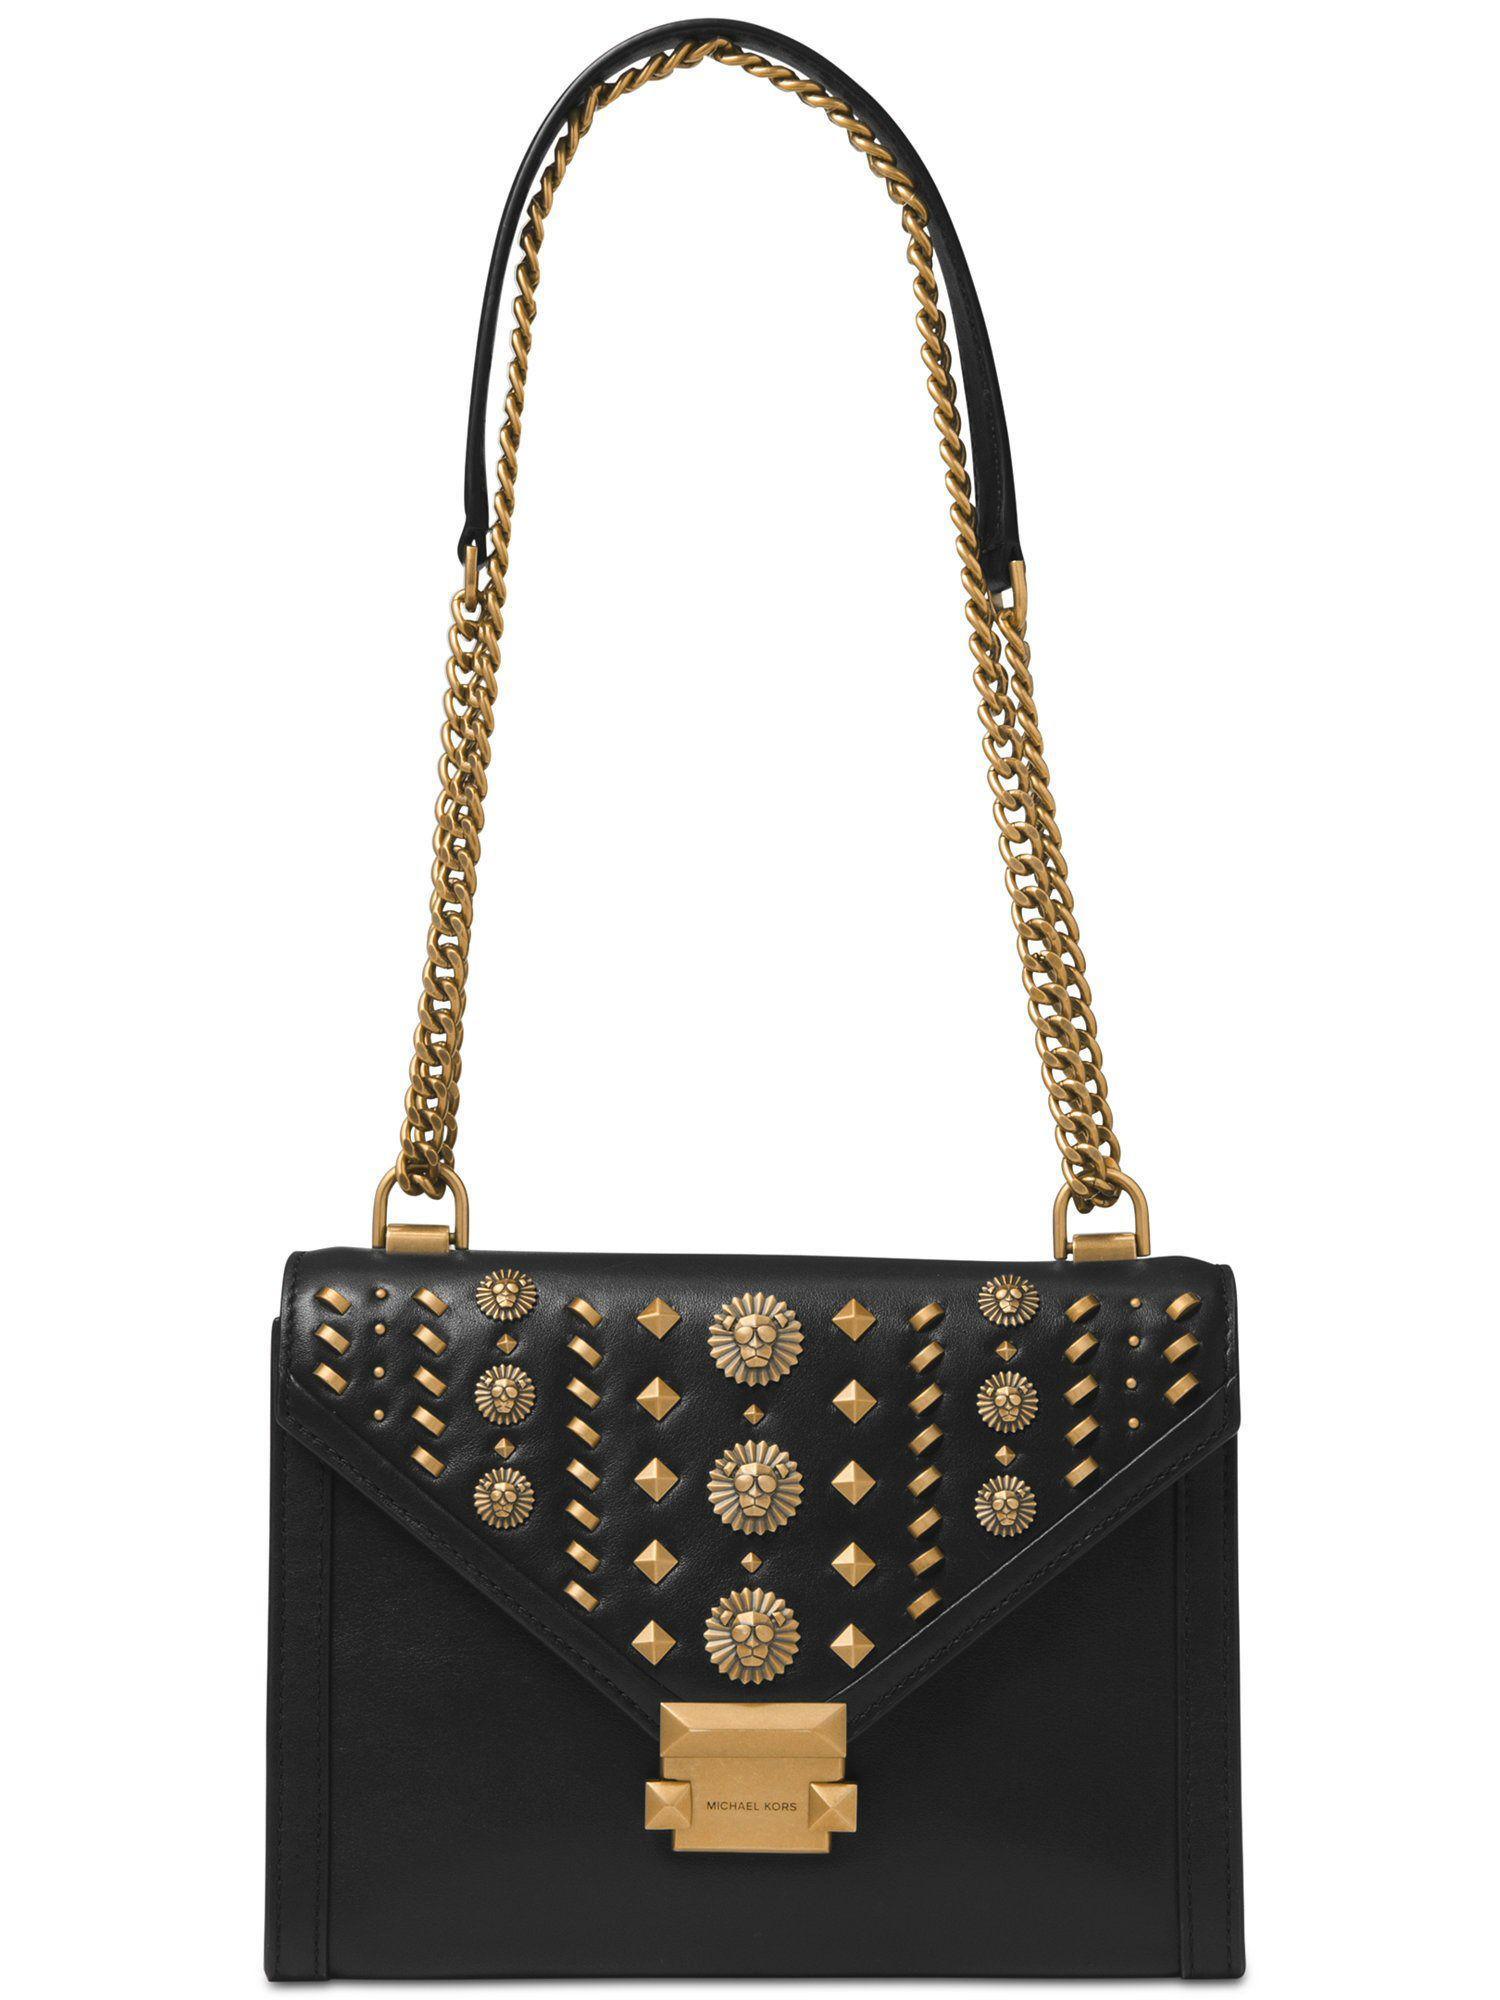 e0a449cee05c Michael Kors - Black Studded Whitney Shoulder Bag - Lyst. View fullscreen